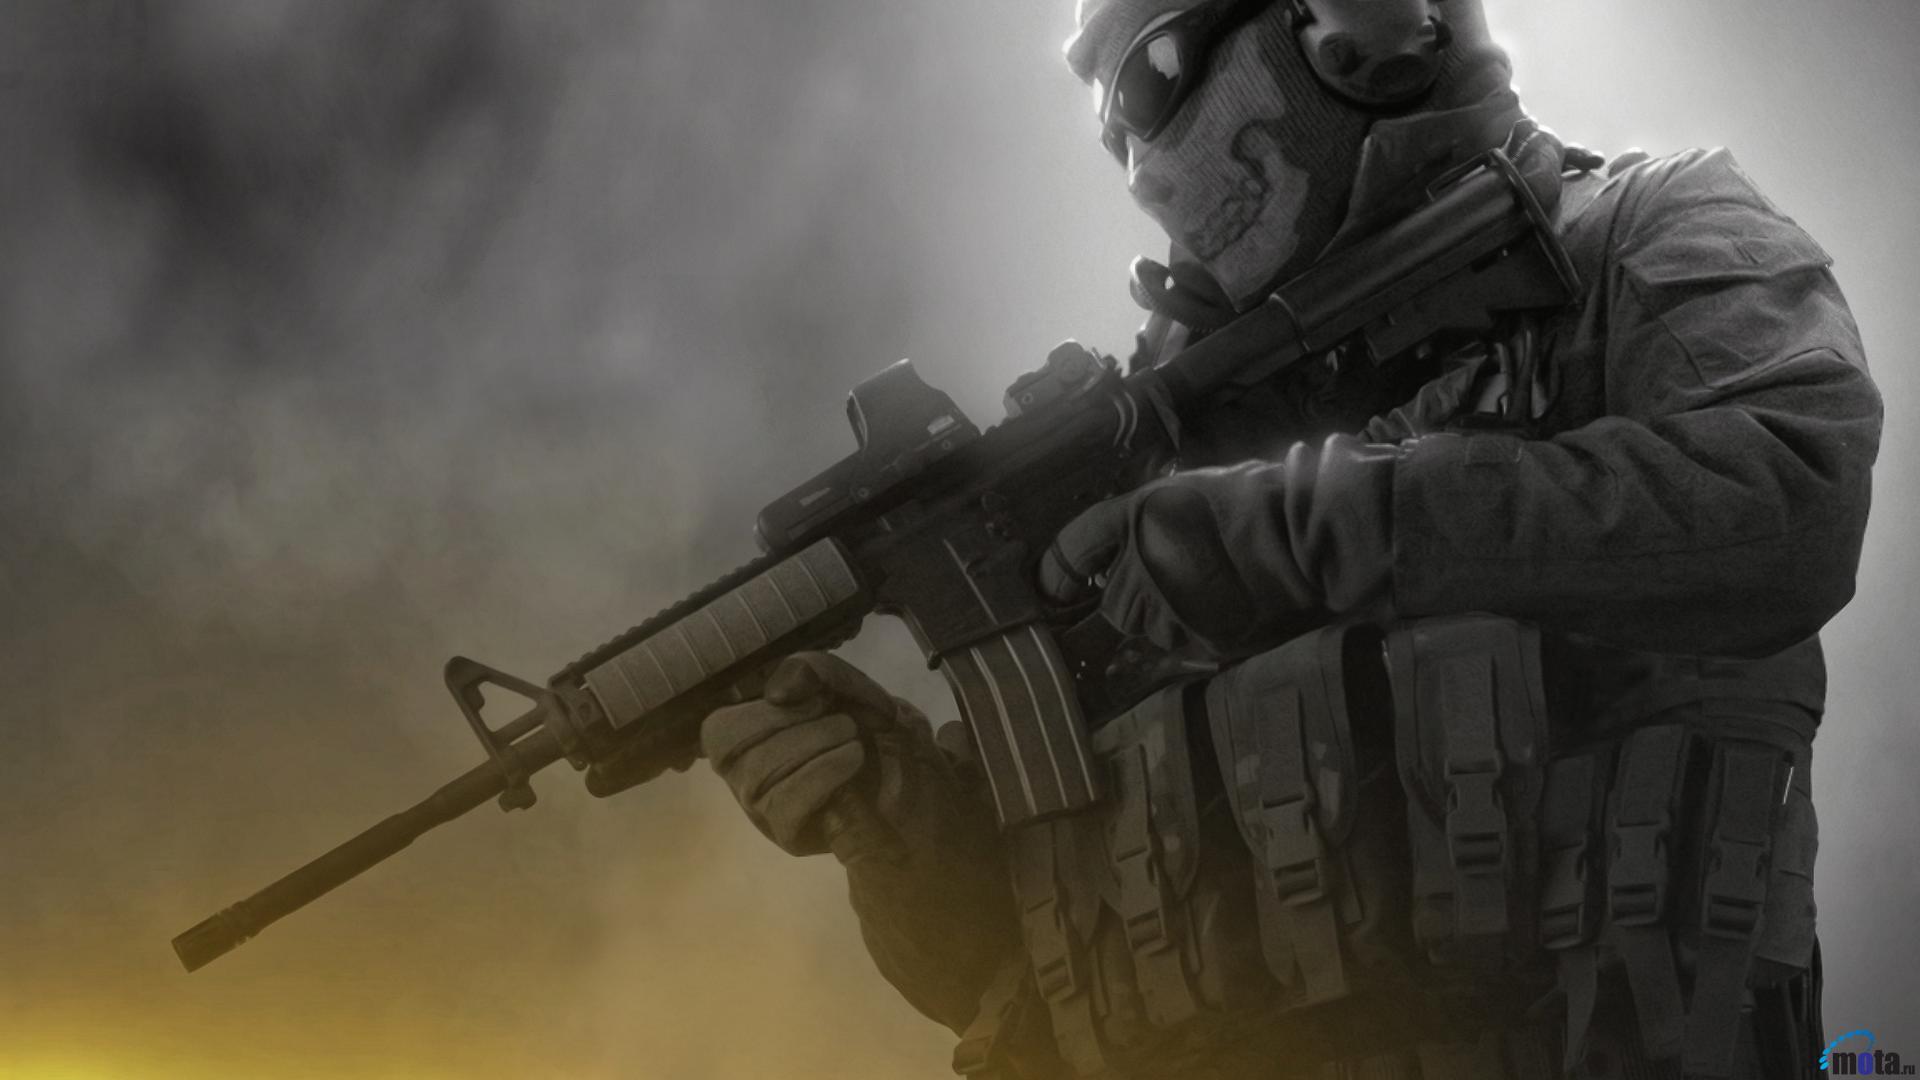 full hd call of duty wallpaper 1080p